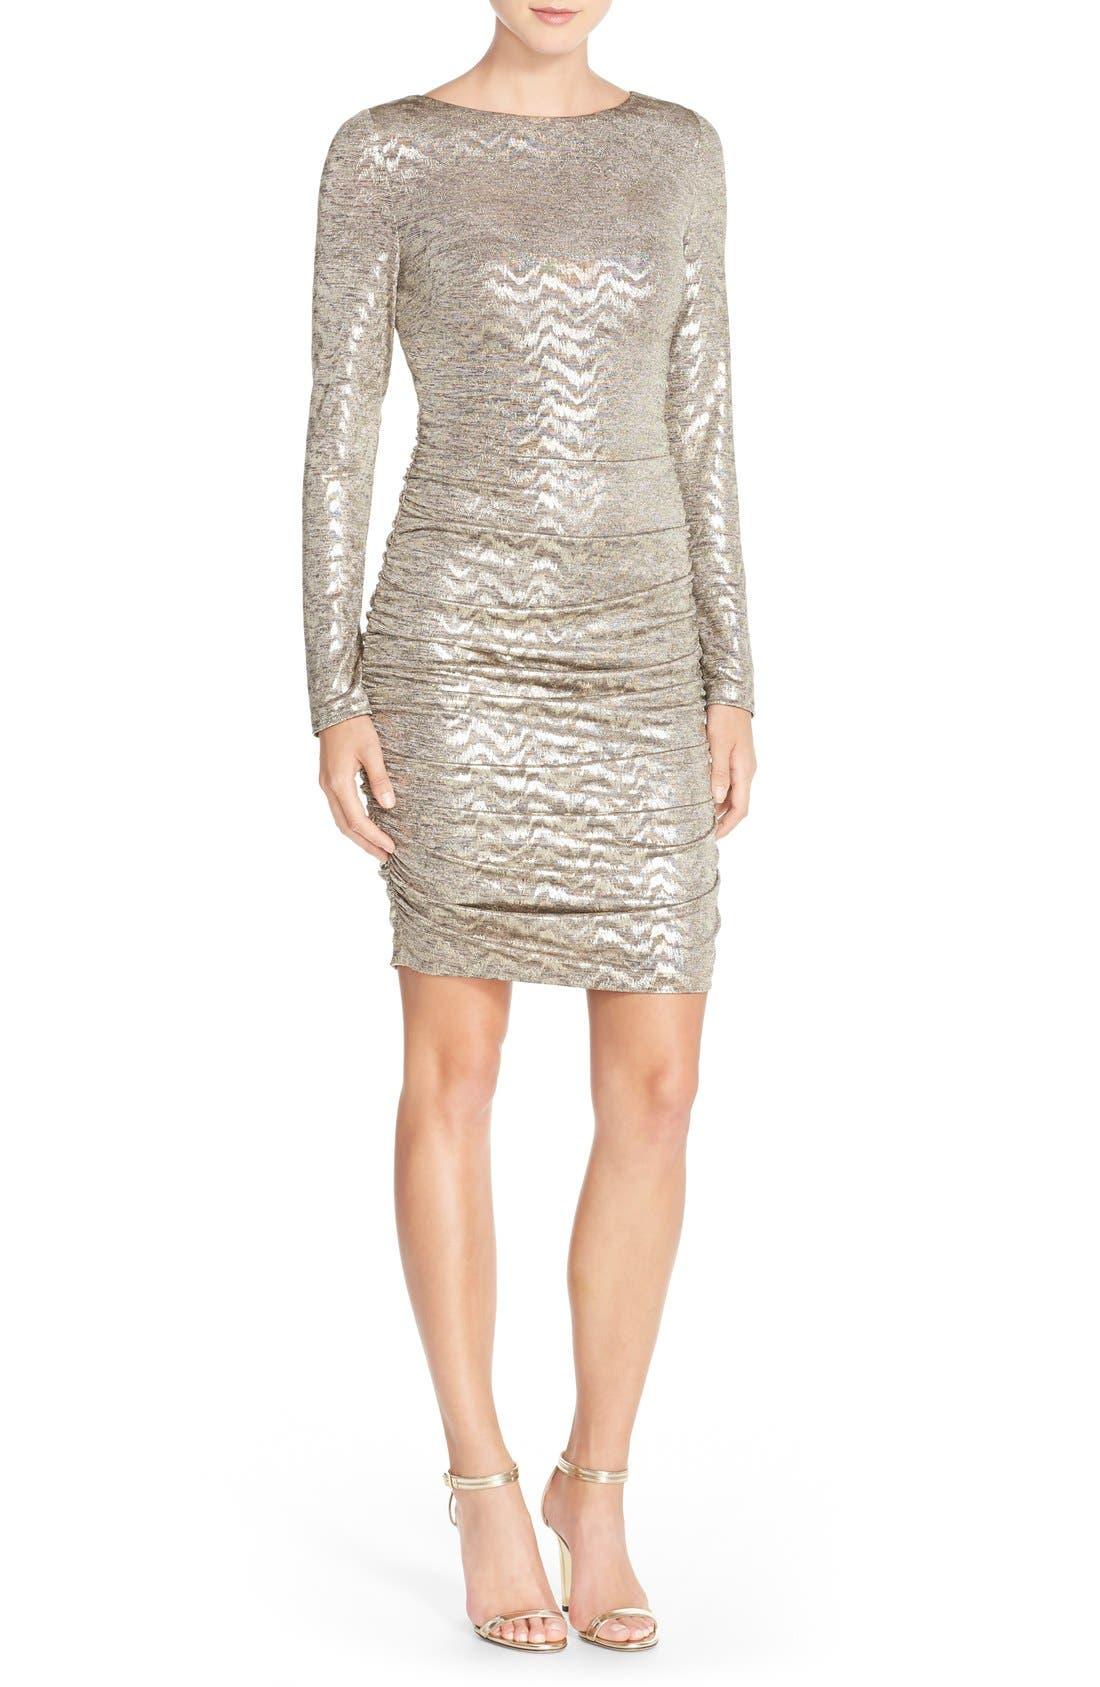 VINCE CAMUTO, Metallic Jersey Body-Con Dress, Alternate thumbnail 6, color, 710